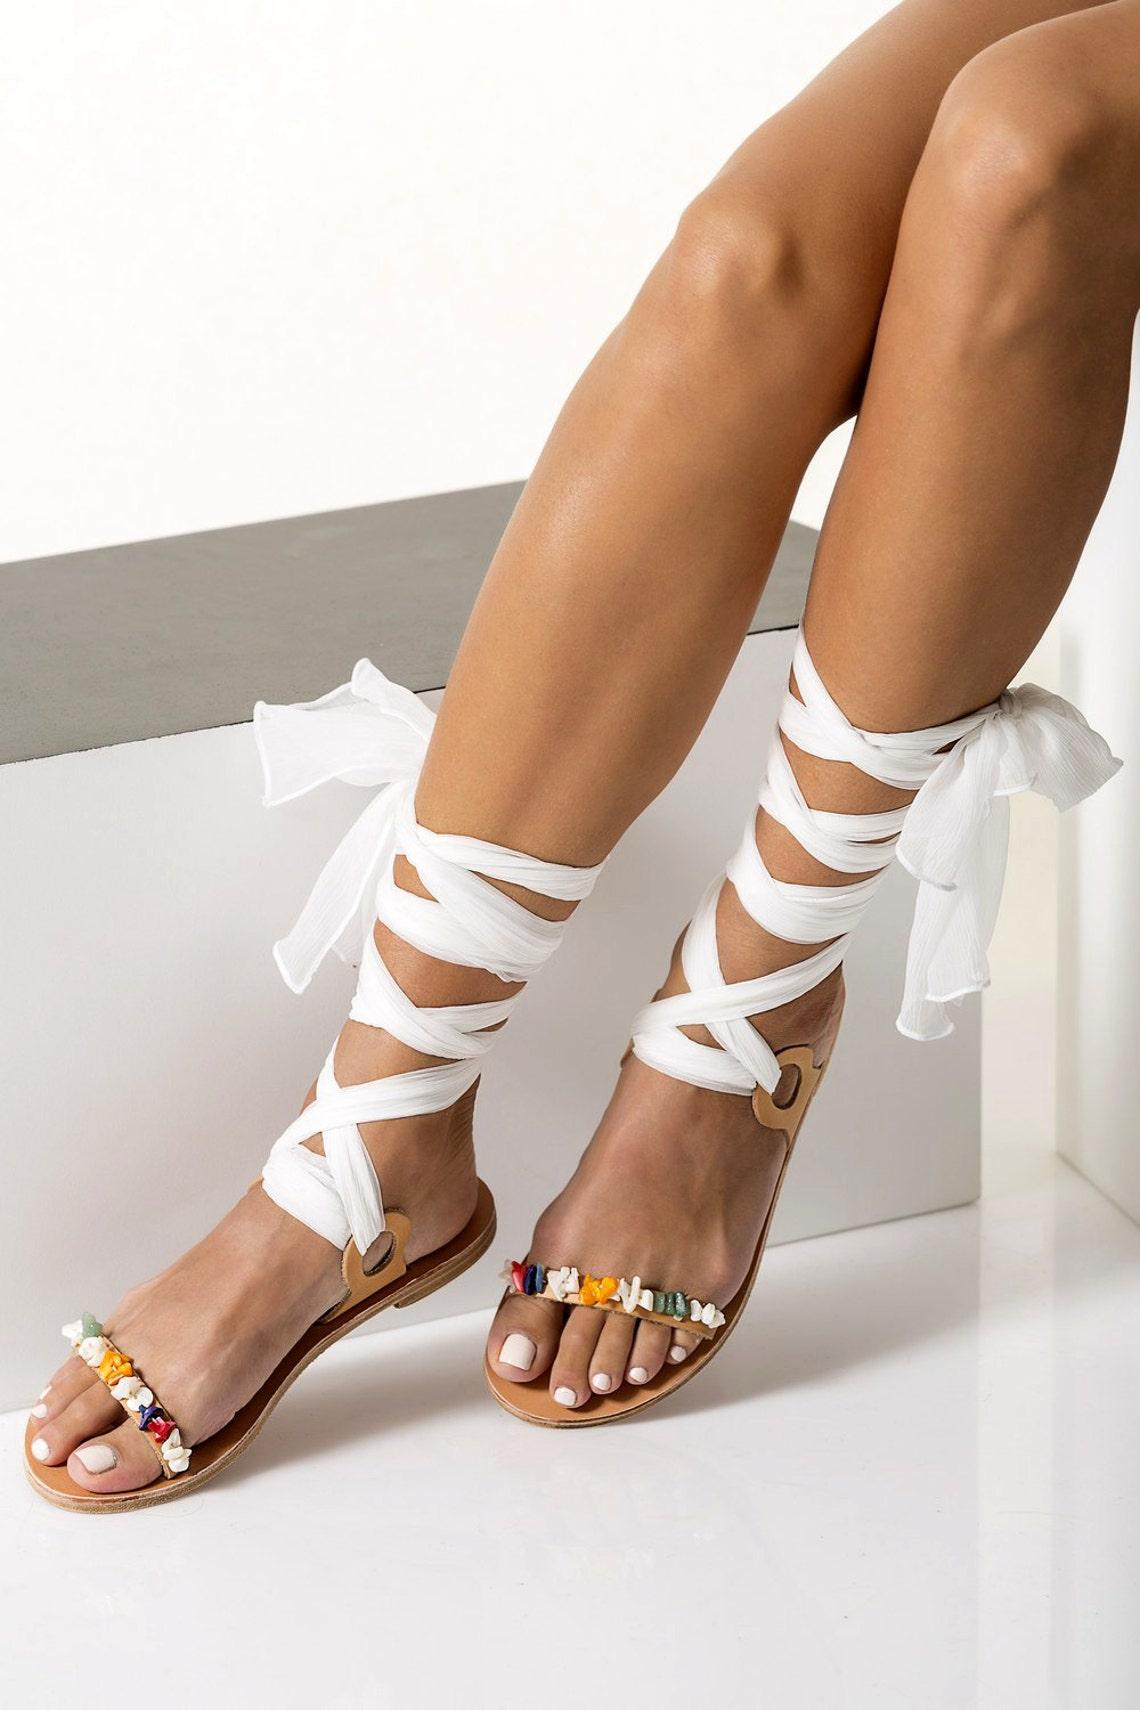 "Wedding Sandals, Neutral Wedding Flats, Bridal Flat Shoes, Pearl Sandals for Bride, Boho Wedding Sandals, Lace up Sandals, ""Charis"""